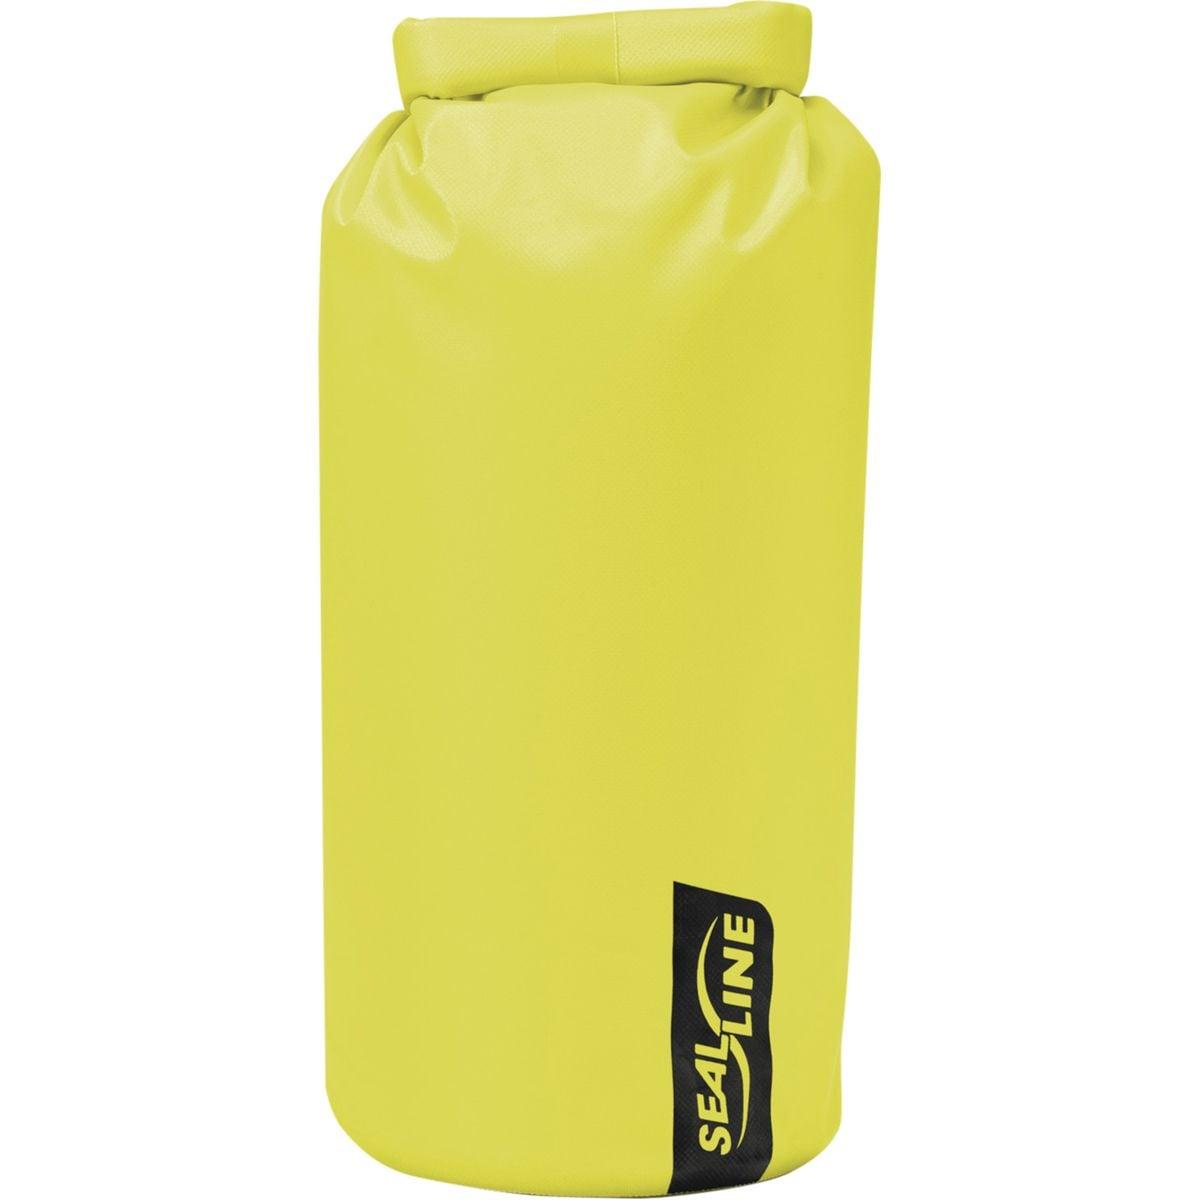 SealLine Baja Dry Bags Yellow, 30L